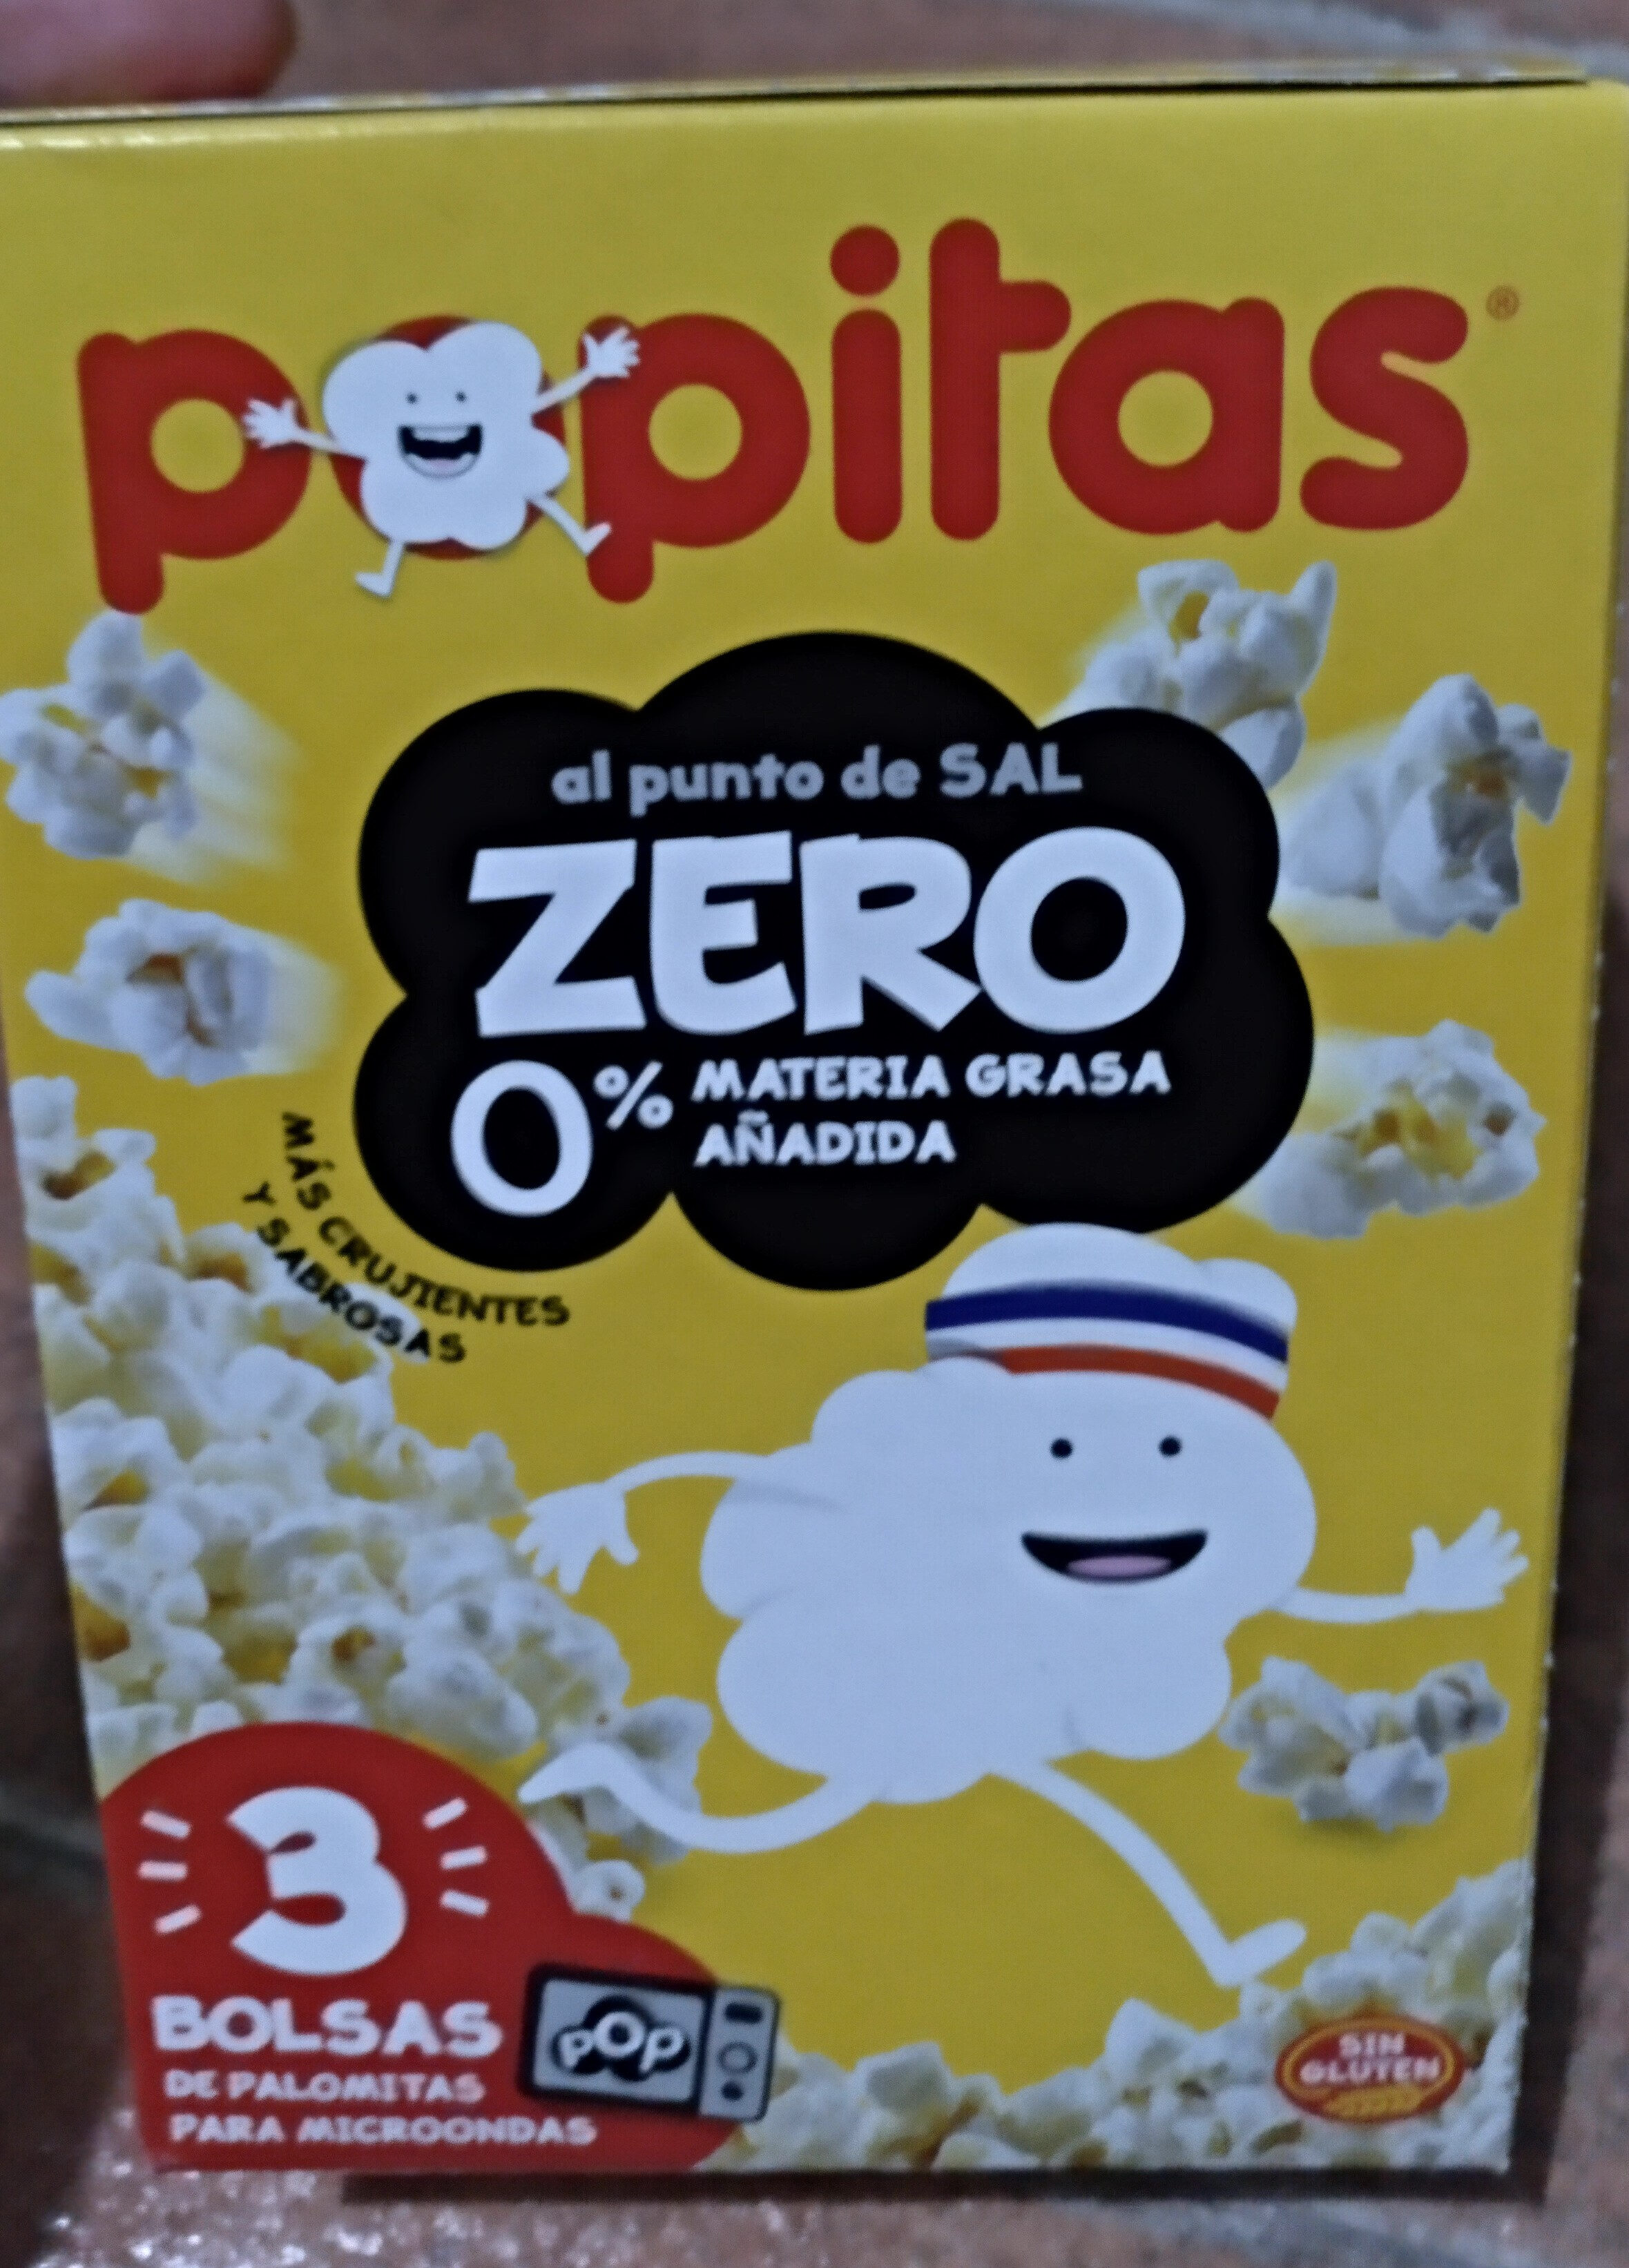 Popitas - Product - en